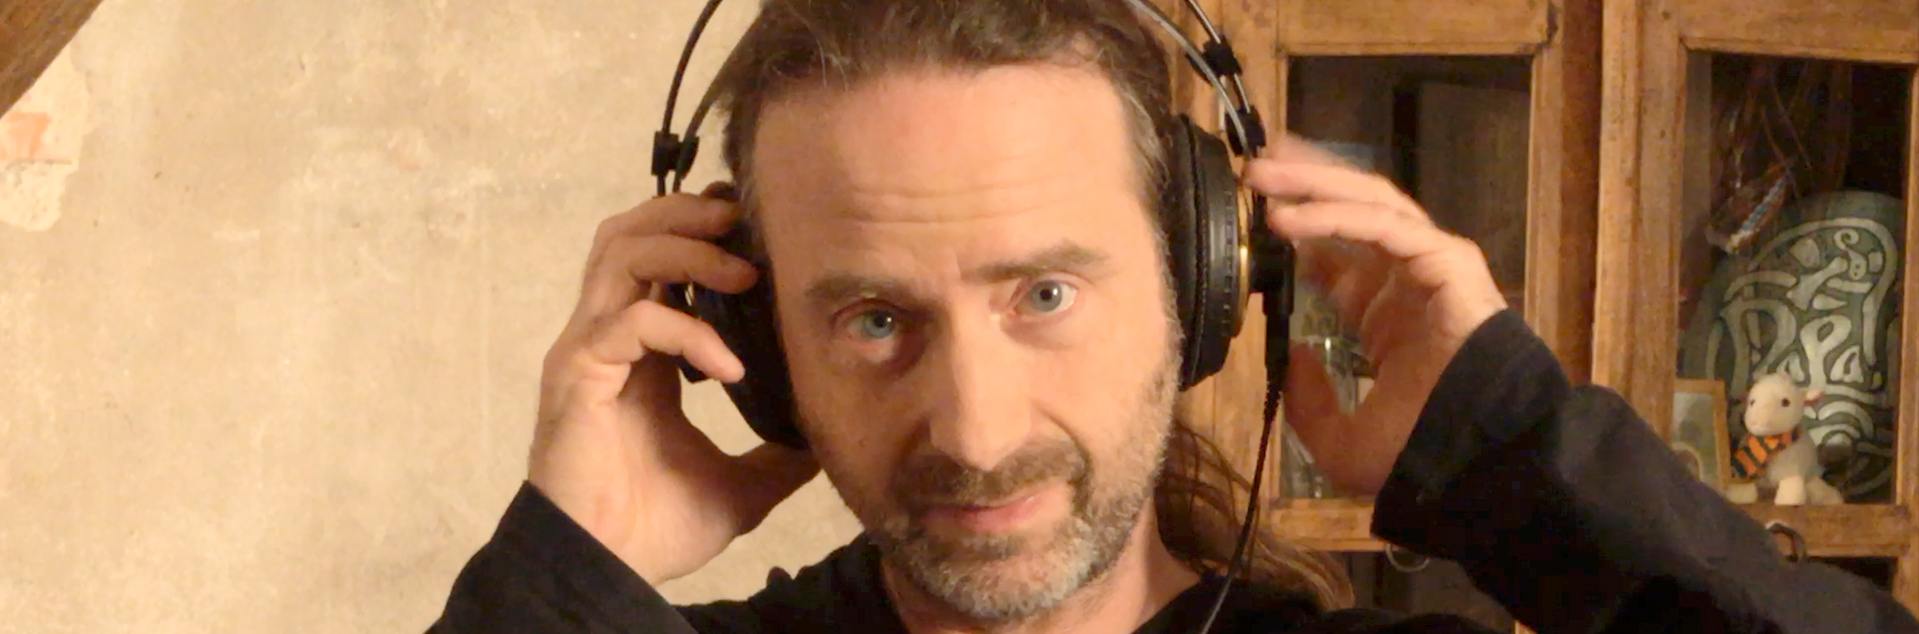 recording-Studio-Tour-Rapalje-Show